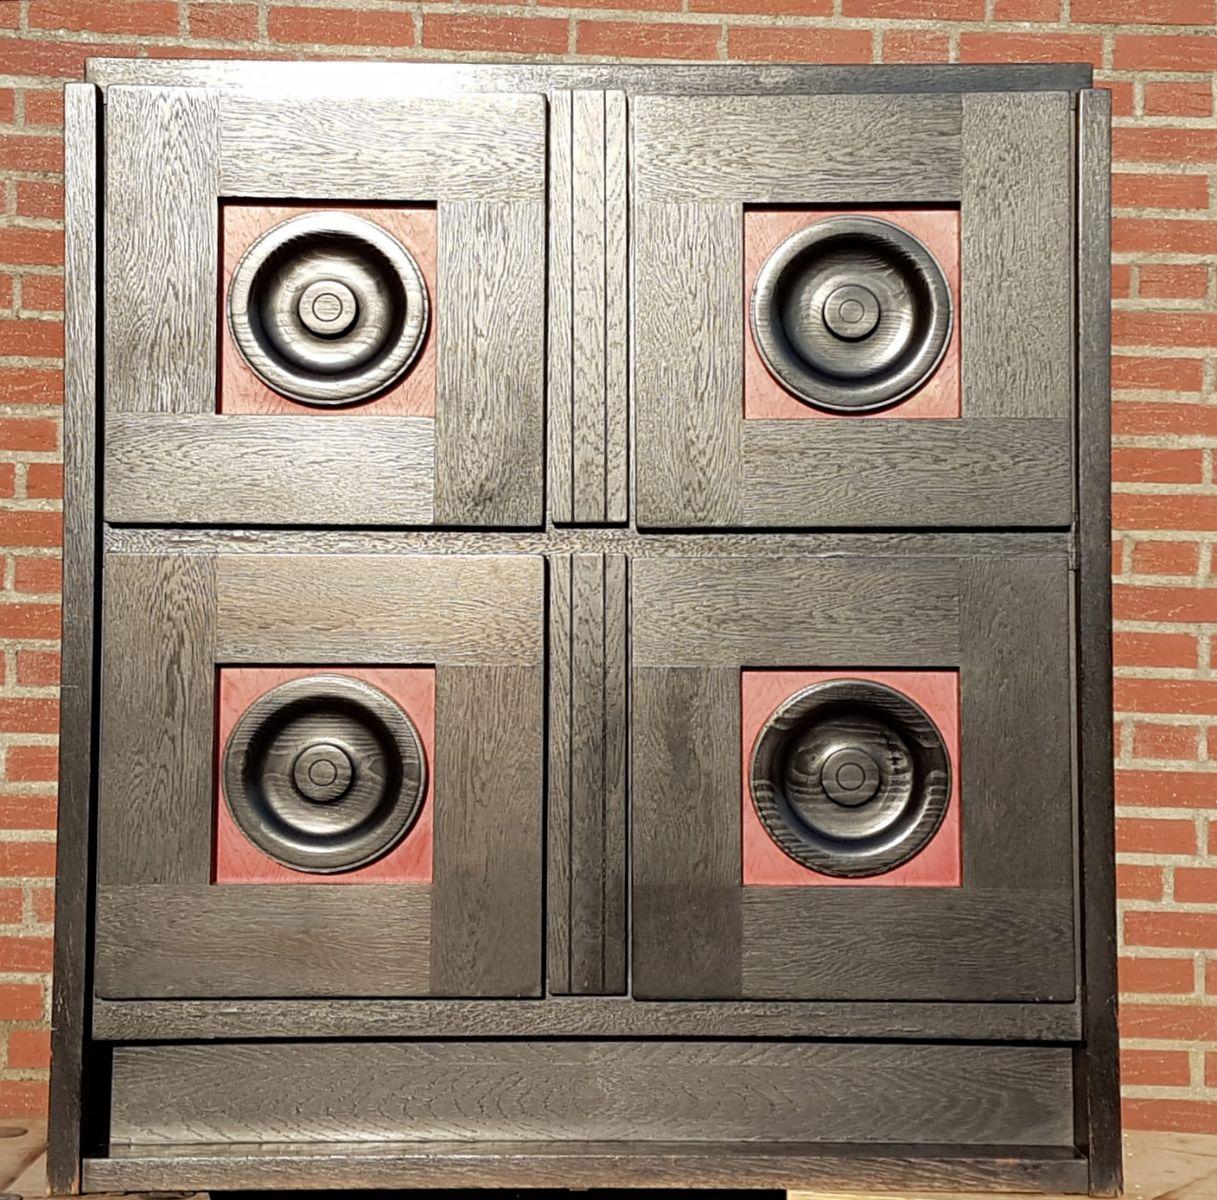 belgischer brutalistischer vintage barschrank bei pamono. Black Bedroom Furniture Sets. Home Design Ideas